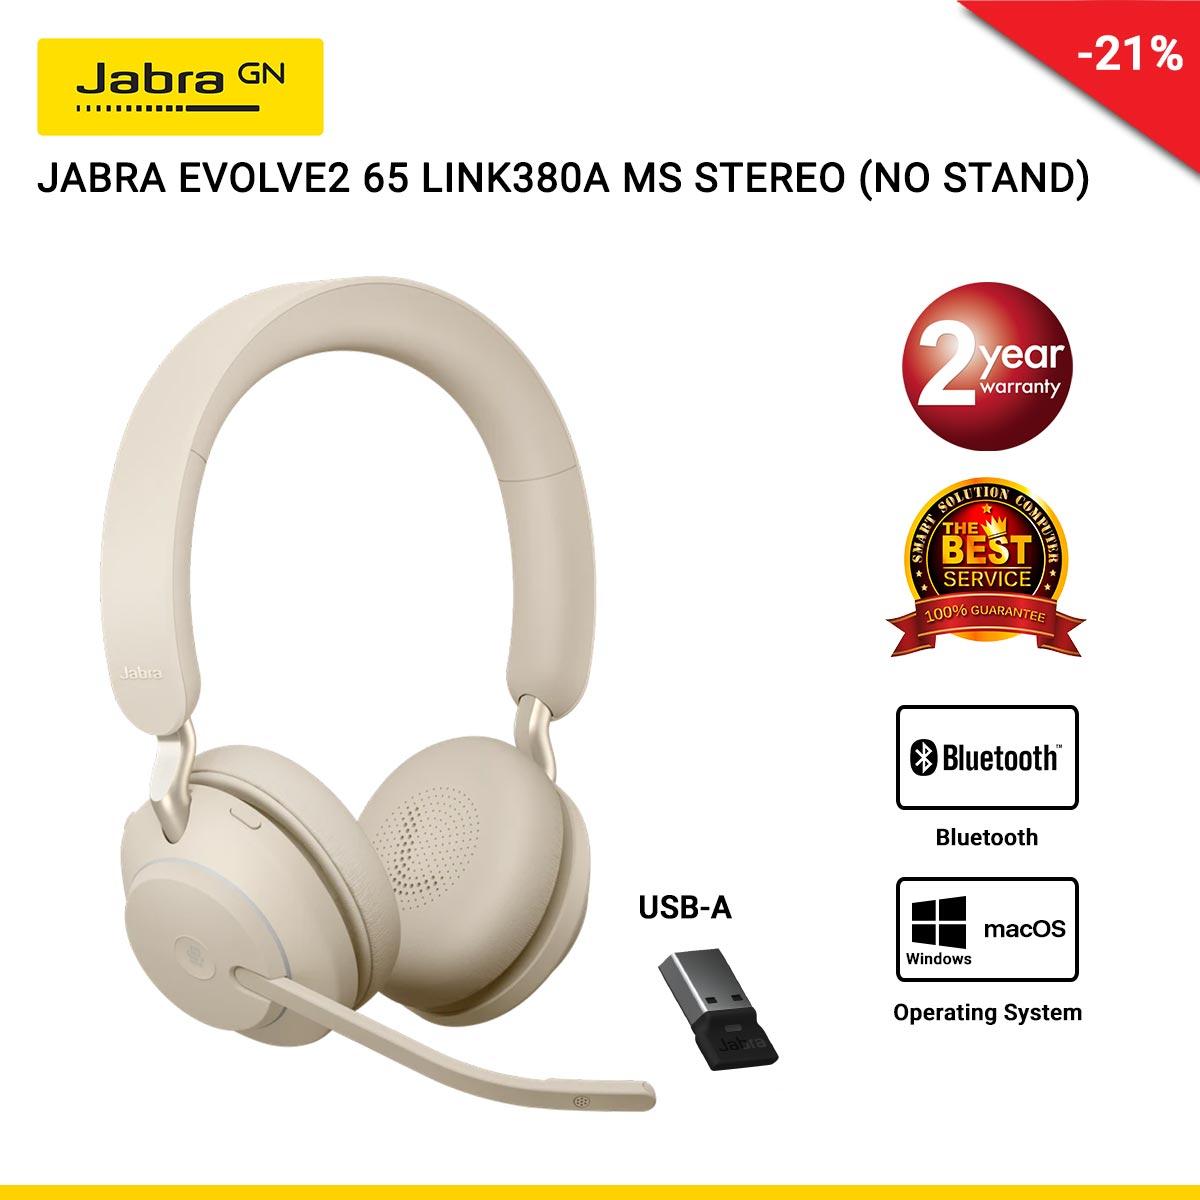 JABRA EVOLVE2 65 LINK380A MS STEREO BEIGE (NO STAND) (JBA-26599-999-998)